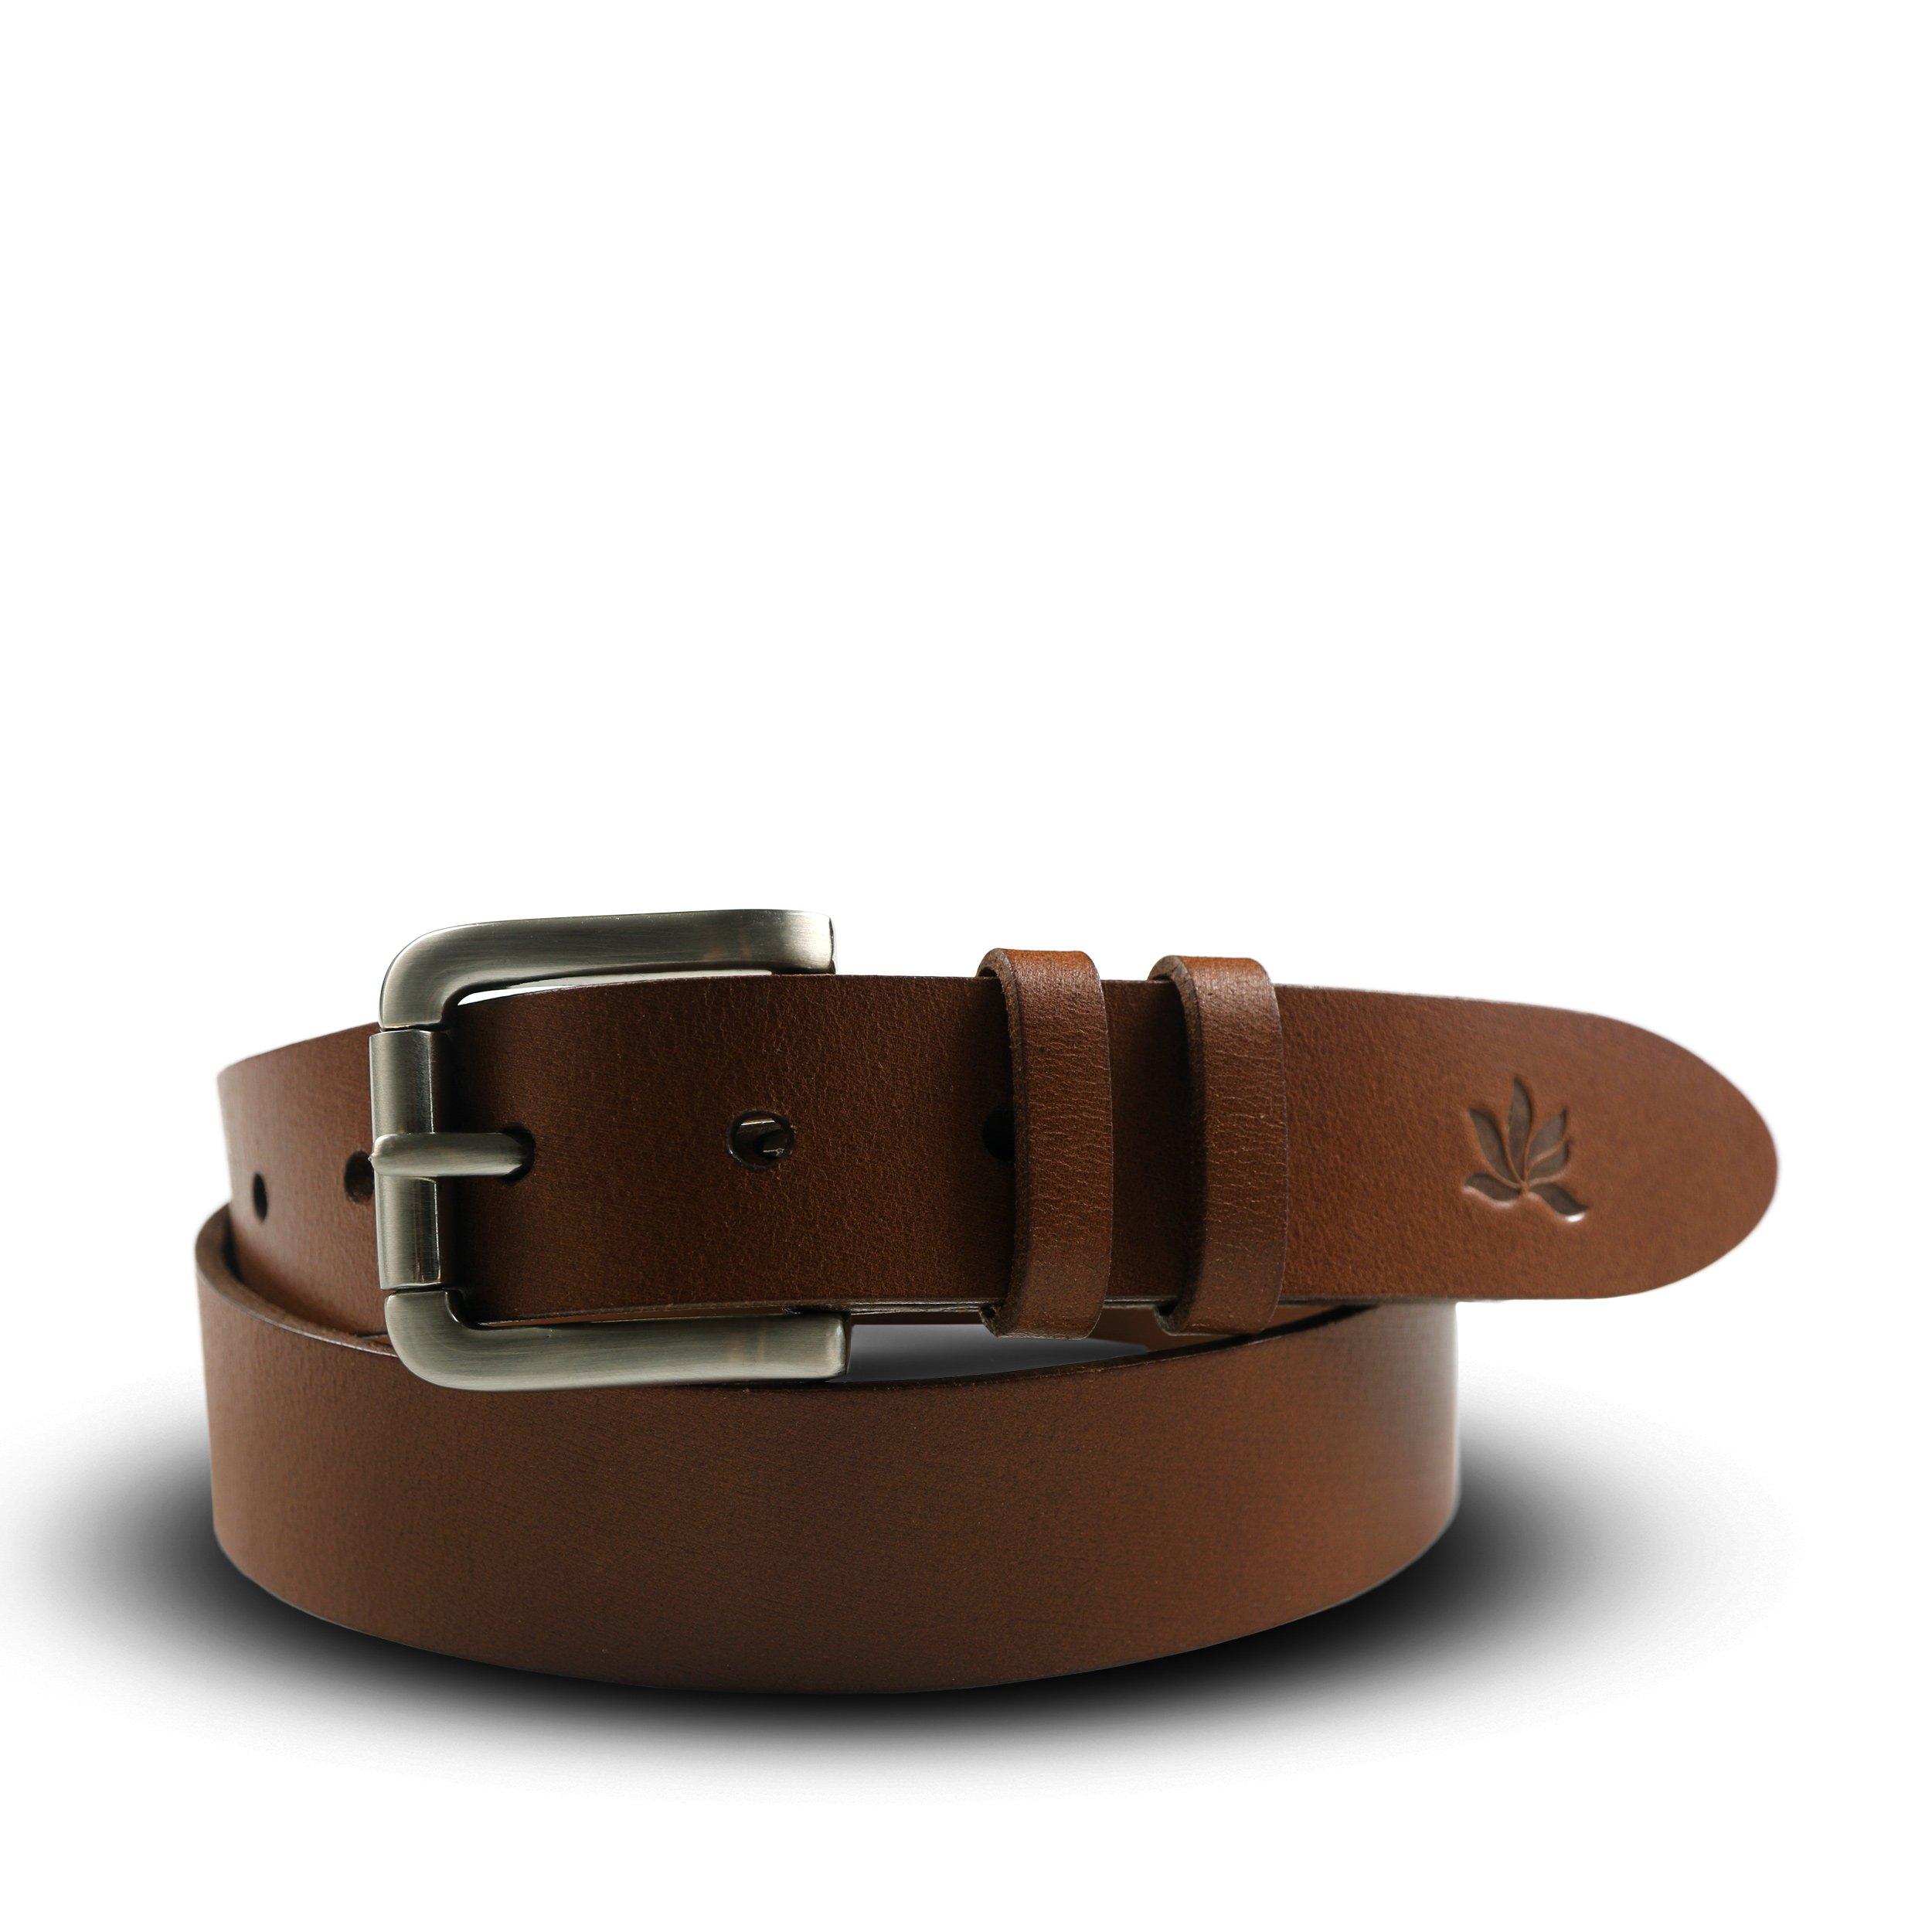 Heavy leather